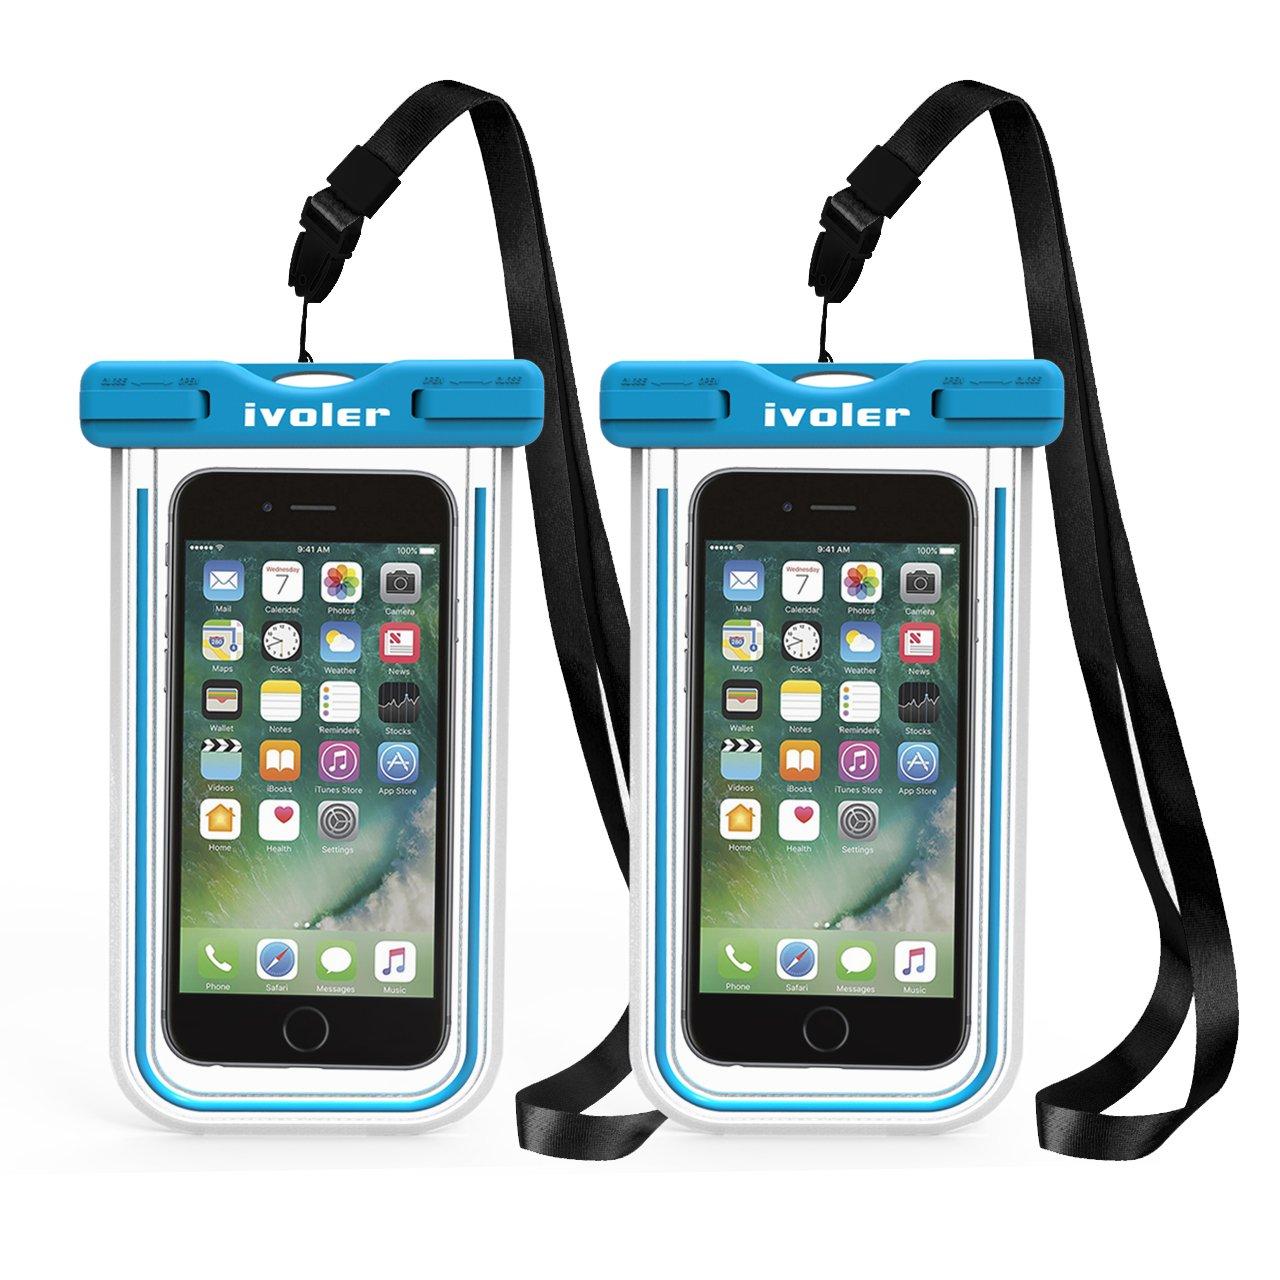 Samsung Custodia Impermeabile Smartphone ECC. 2 Pezzi iVoler Huawei Blu+Verde IPX8 Borsa Impermeabile Sacchetto Impermeabile Cellulare Dry Bag Universale Waterproof Cover Case per iPhone